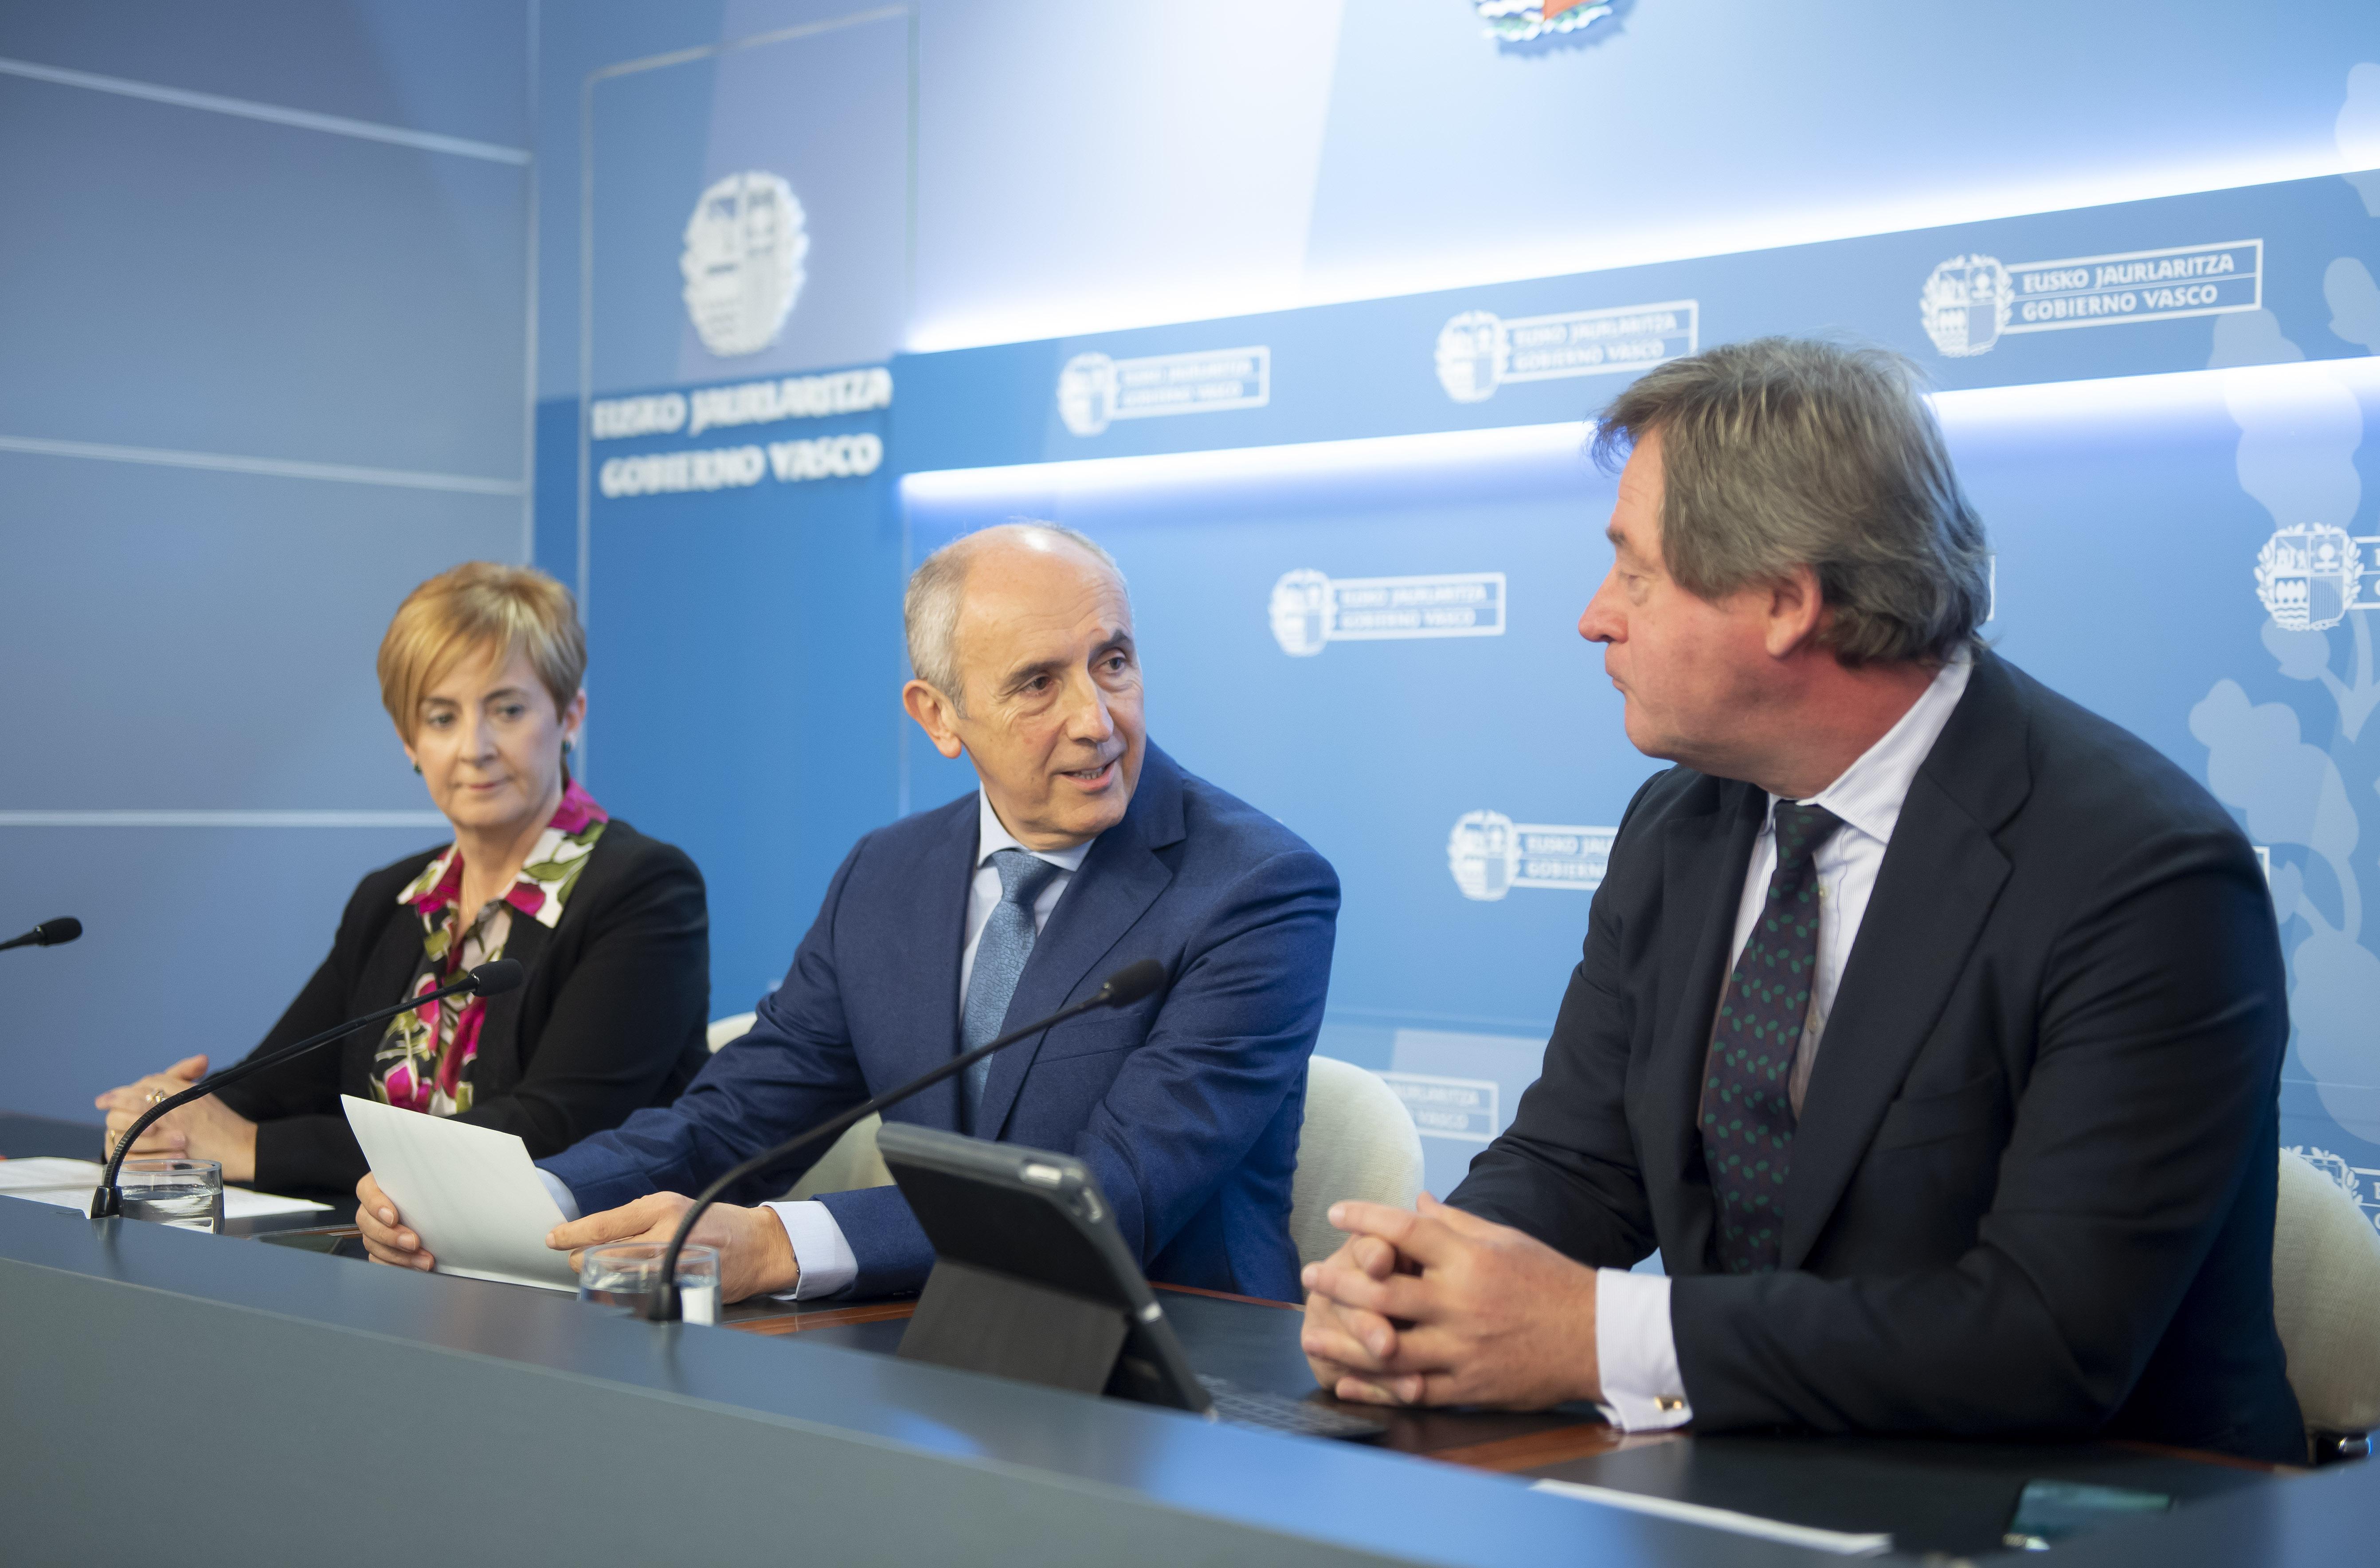 2019_11_19_consejo_gobierno_03.jpg